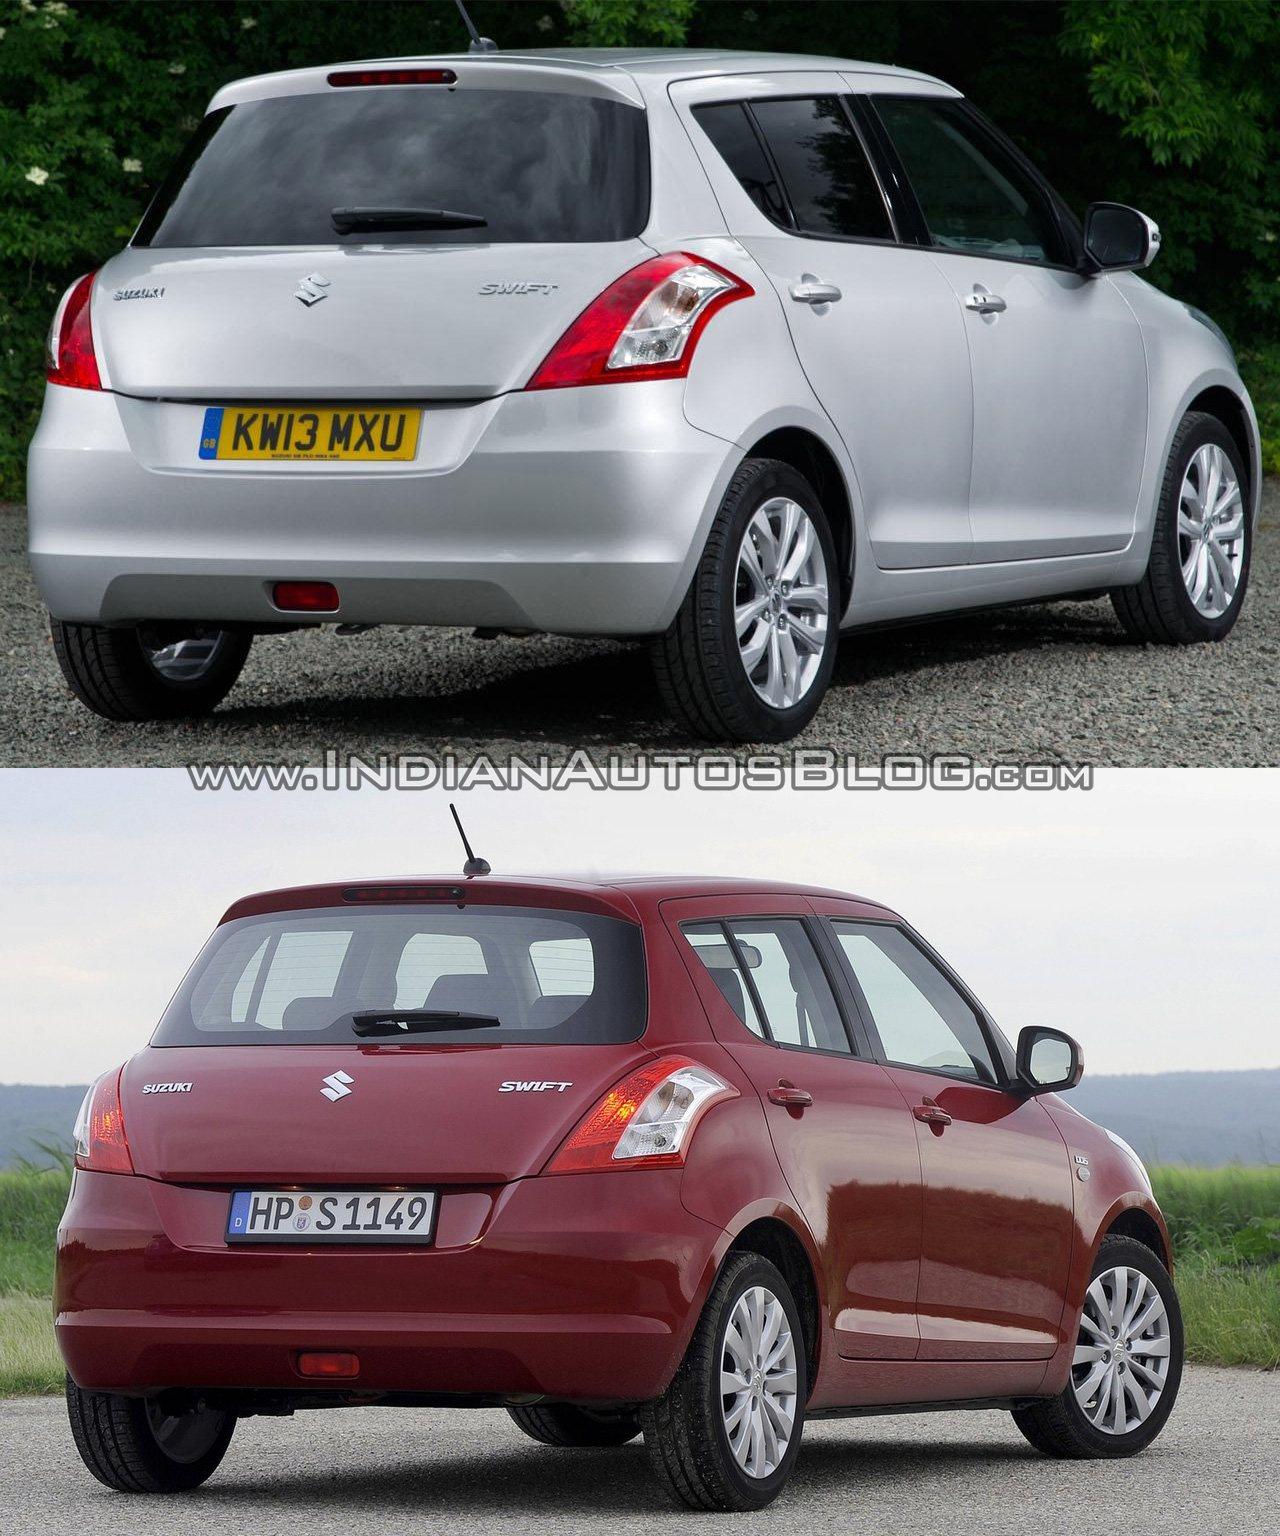 Maruti Suzuki Swift New Model Price